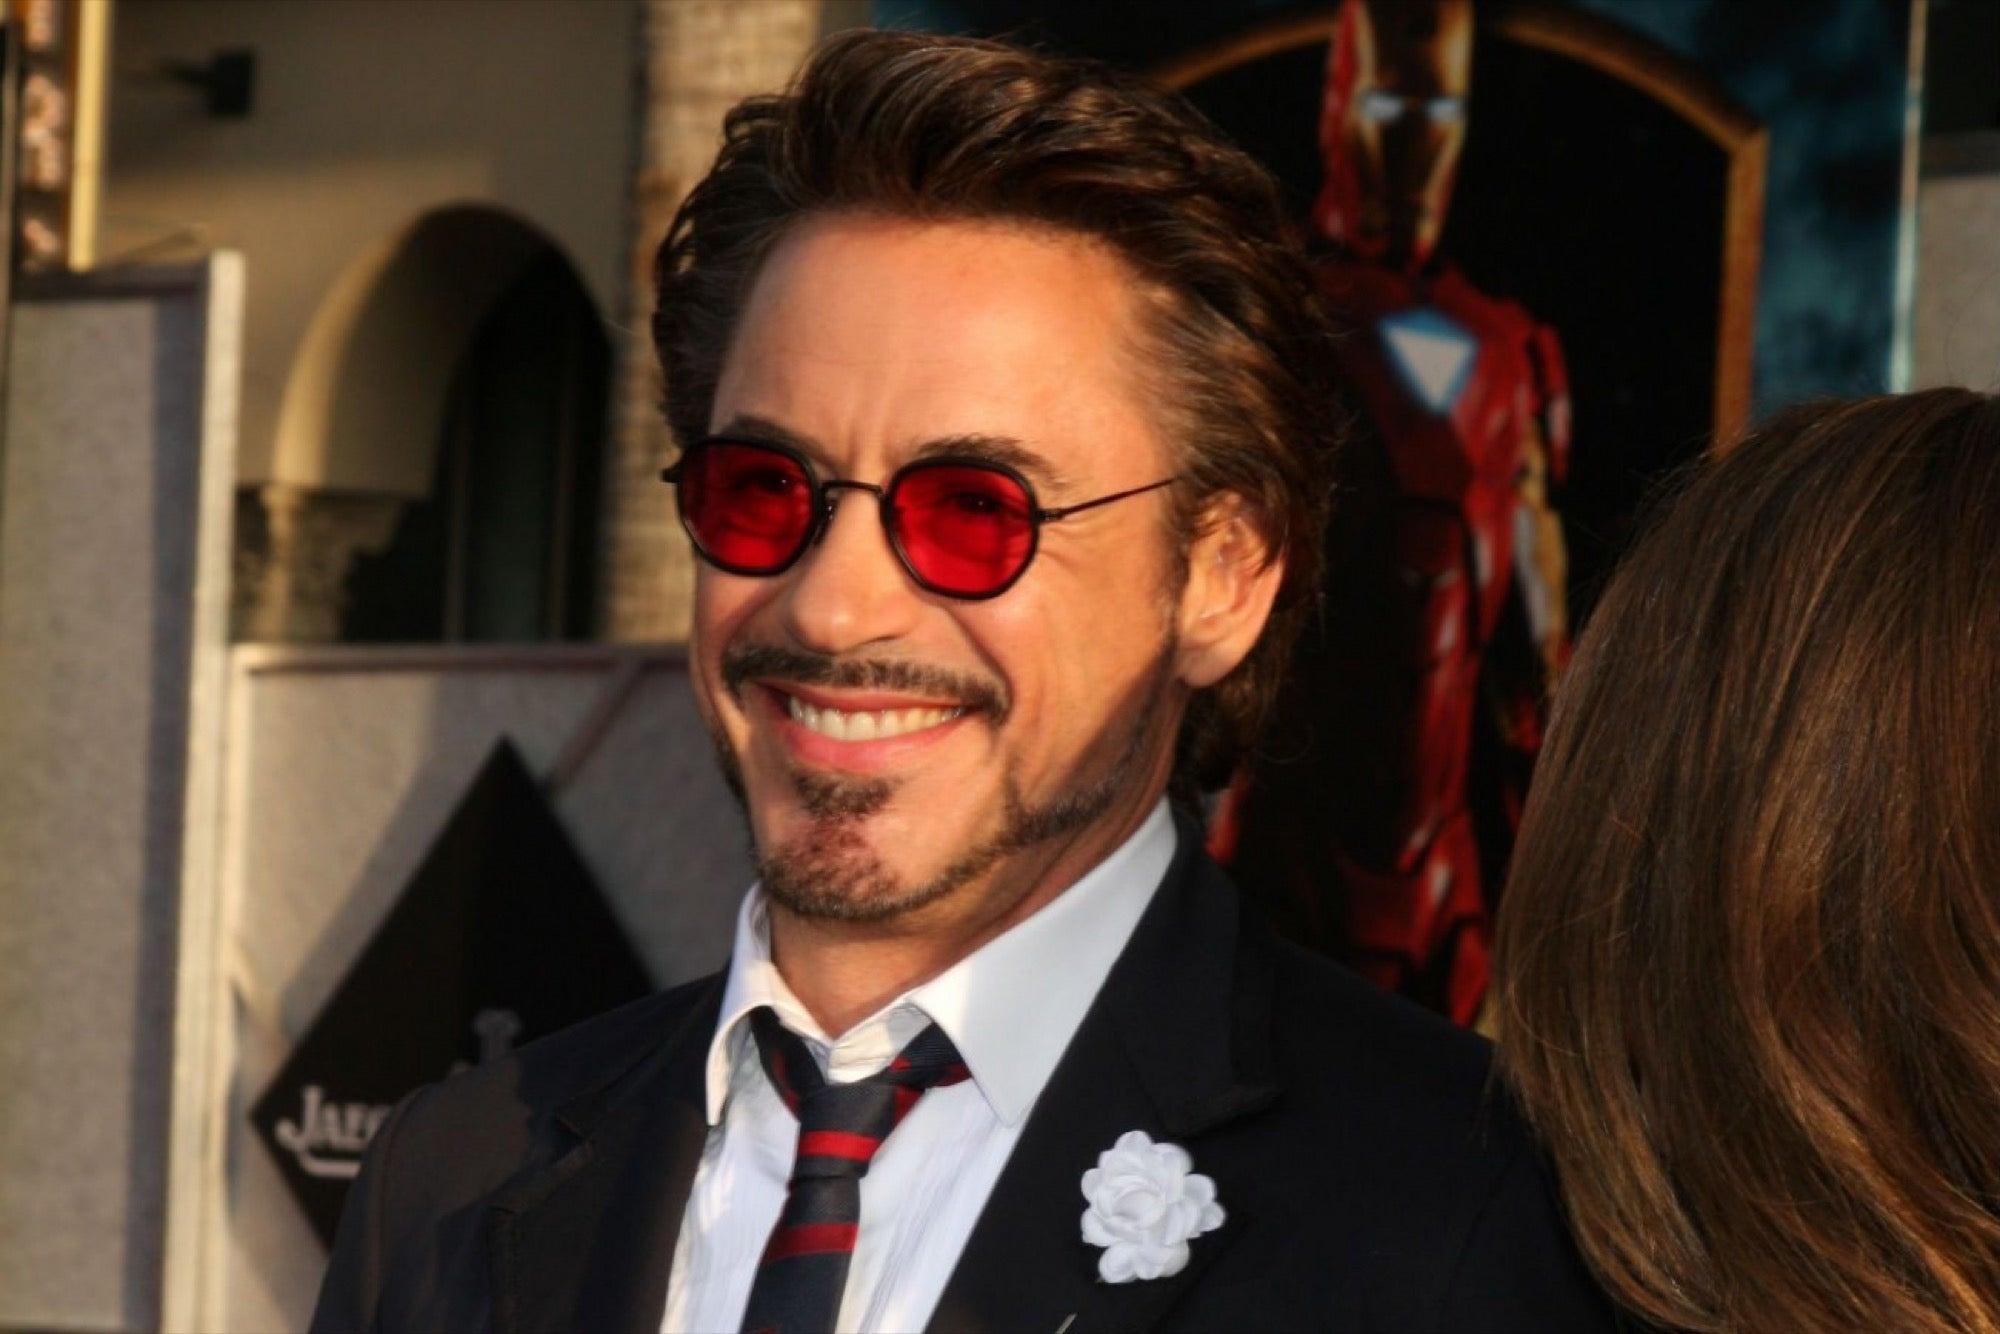 Salva tu marca al estilo Robert Downey, Jr.